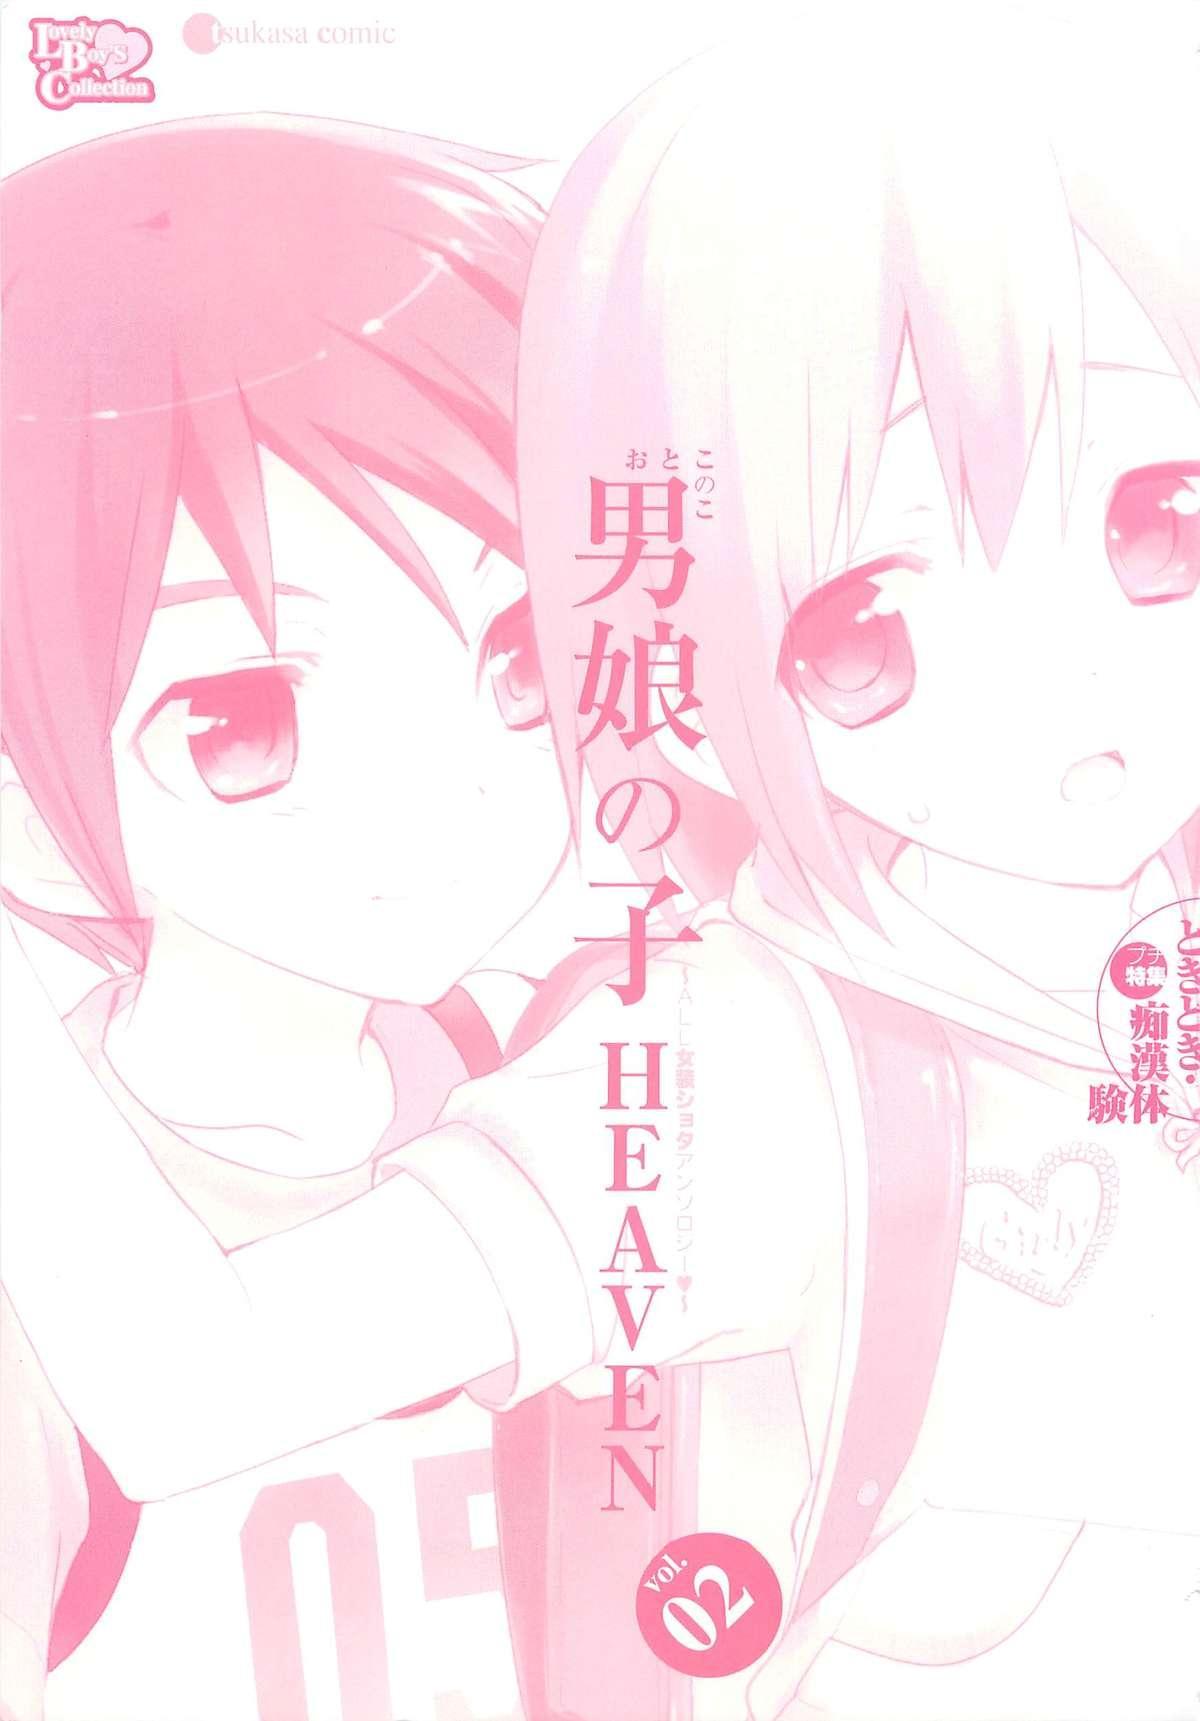 Otokonoko HEAVEN Vol. 02 Dokidoki Chikan Taiken 2